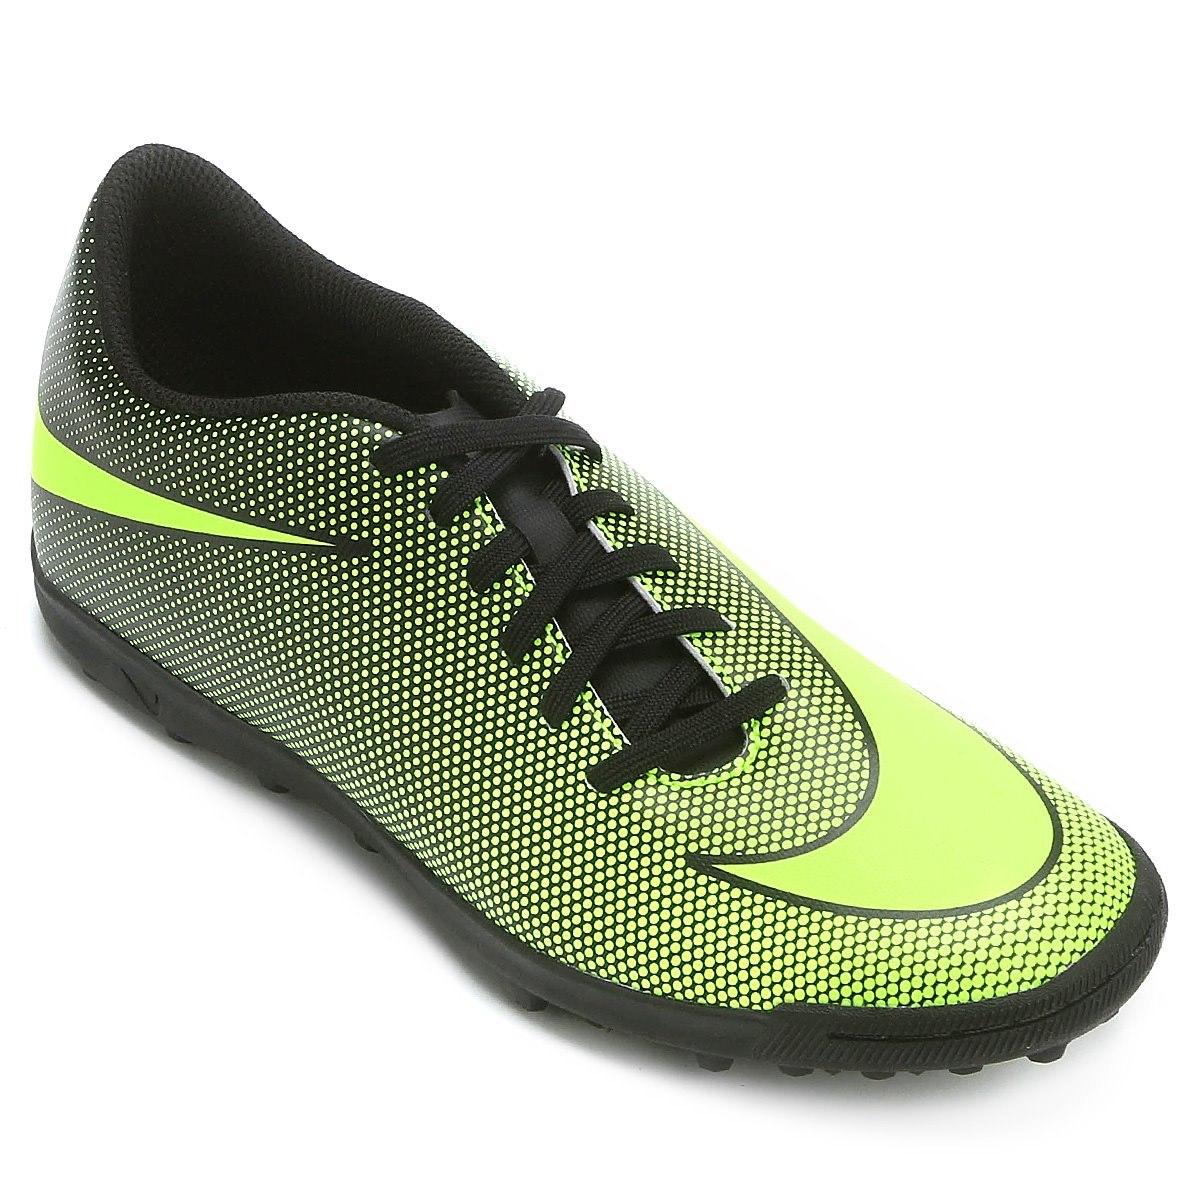 Ii Nike 650 En Tf Futbol 00 Bravata Tenis Mercurial Rapido vqxEaTvX